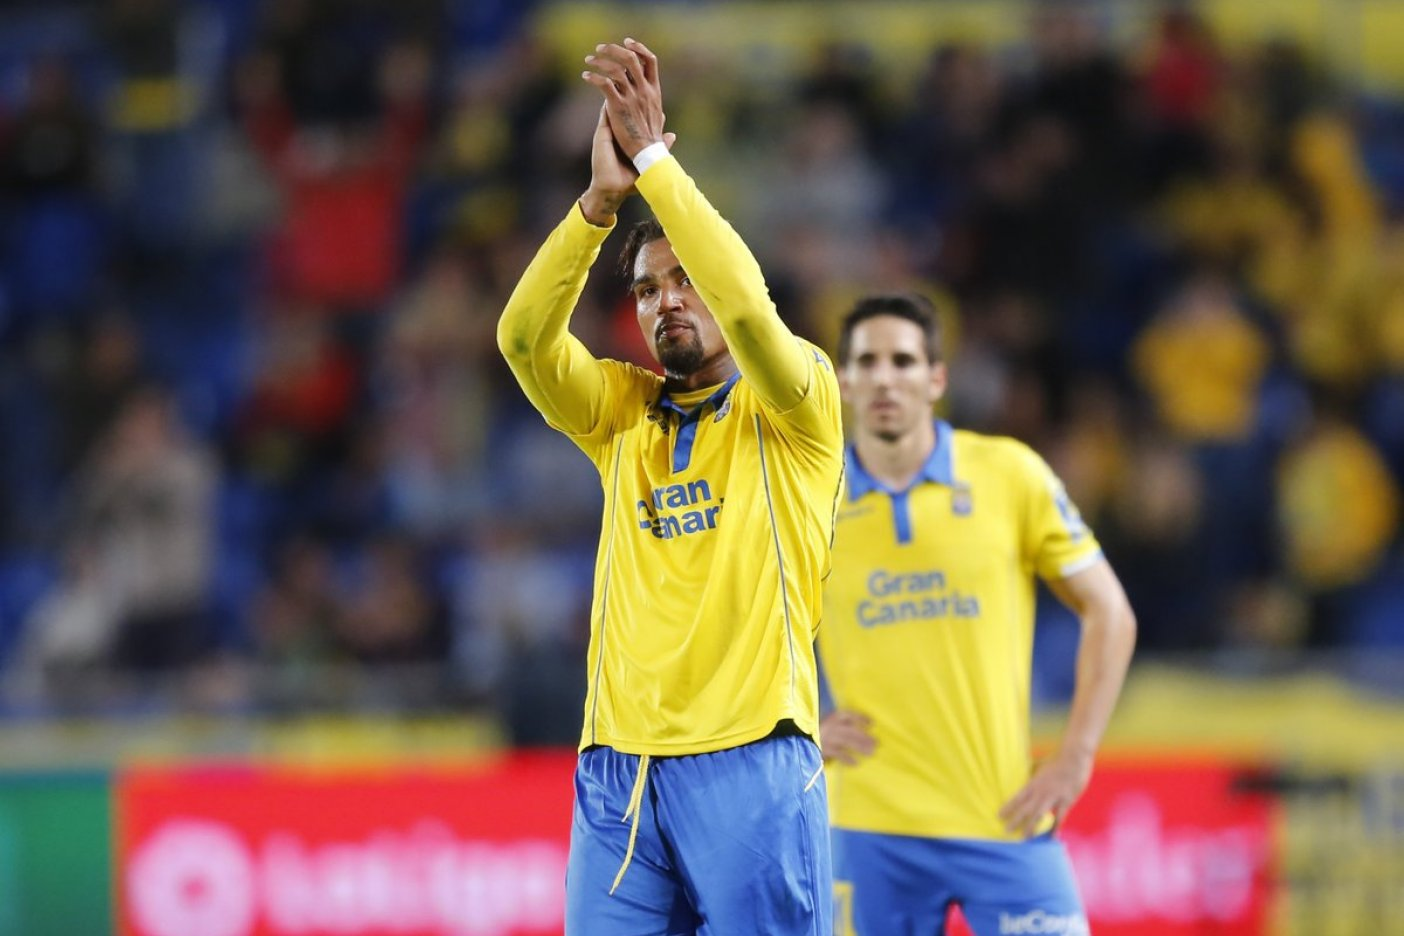 Kevin-Prince Boateng se desvincula de Las Palmas